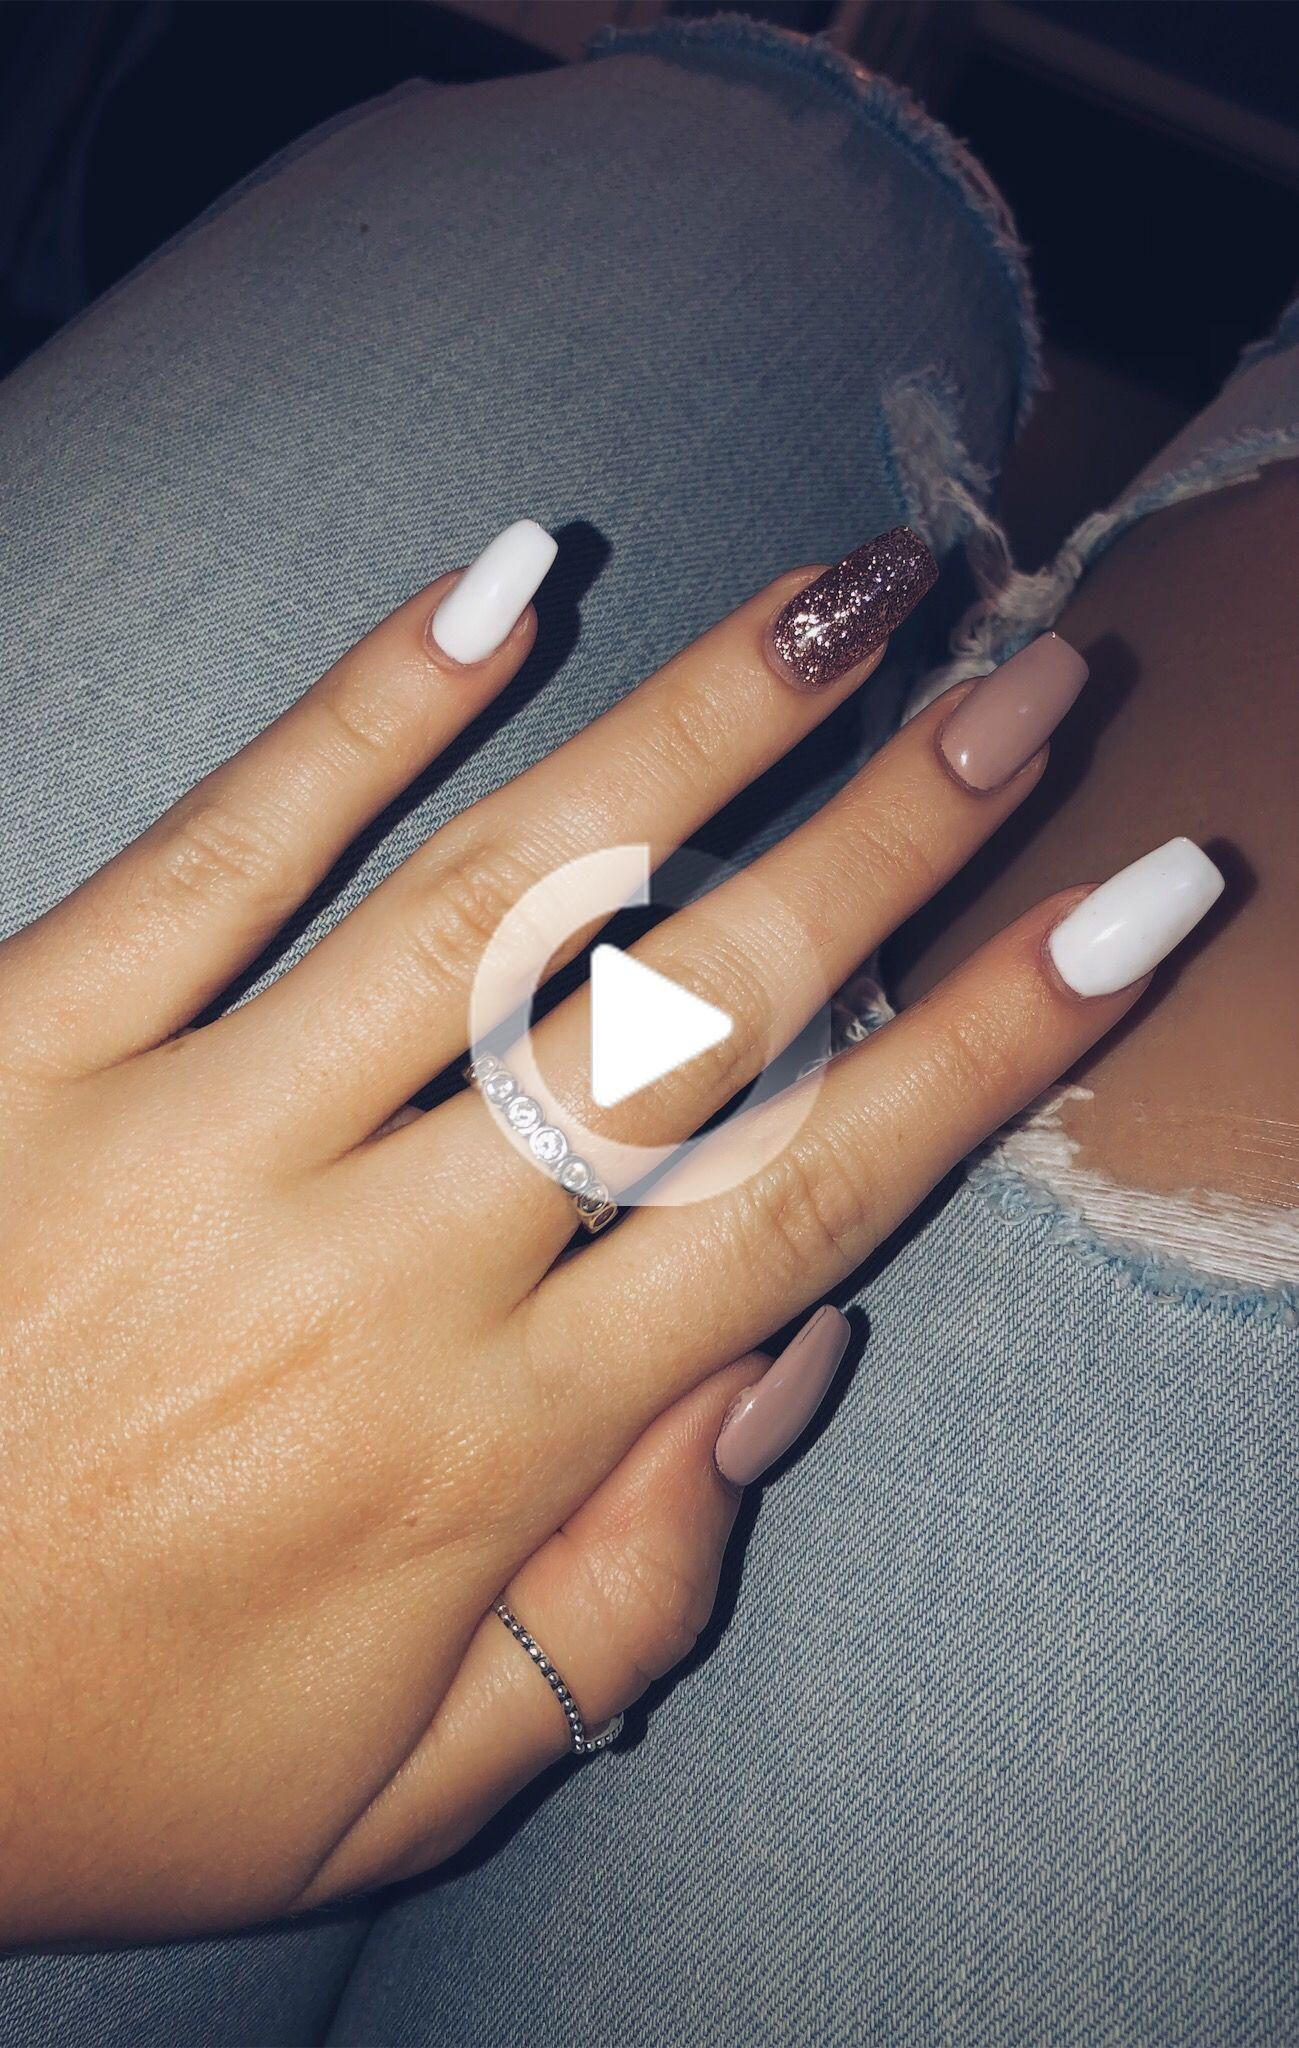 Rose Gold Gel Nails Long Pink White Rose Gold Sparkle In 2020 Gold Sparkle Nails Gold Gel Nails Gold Nails